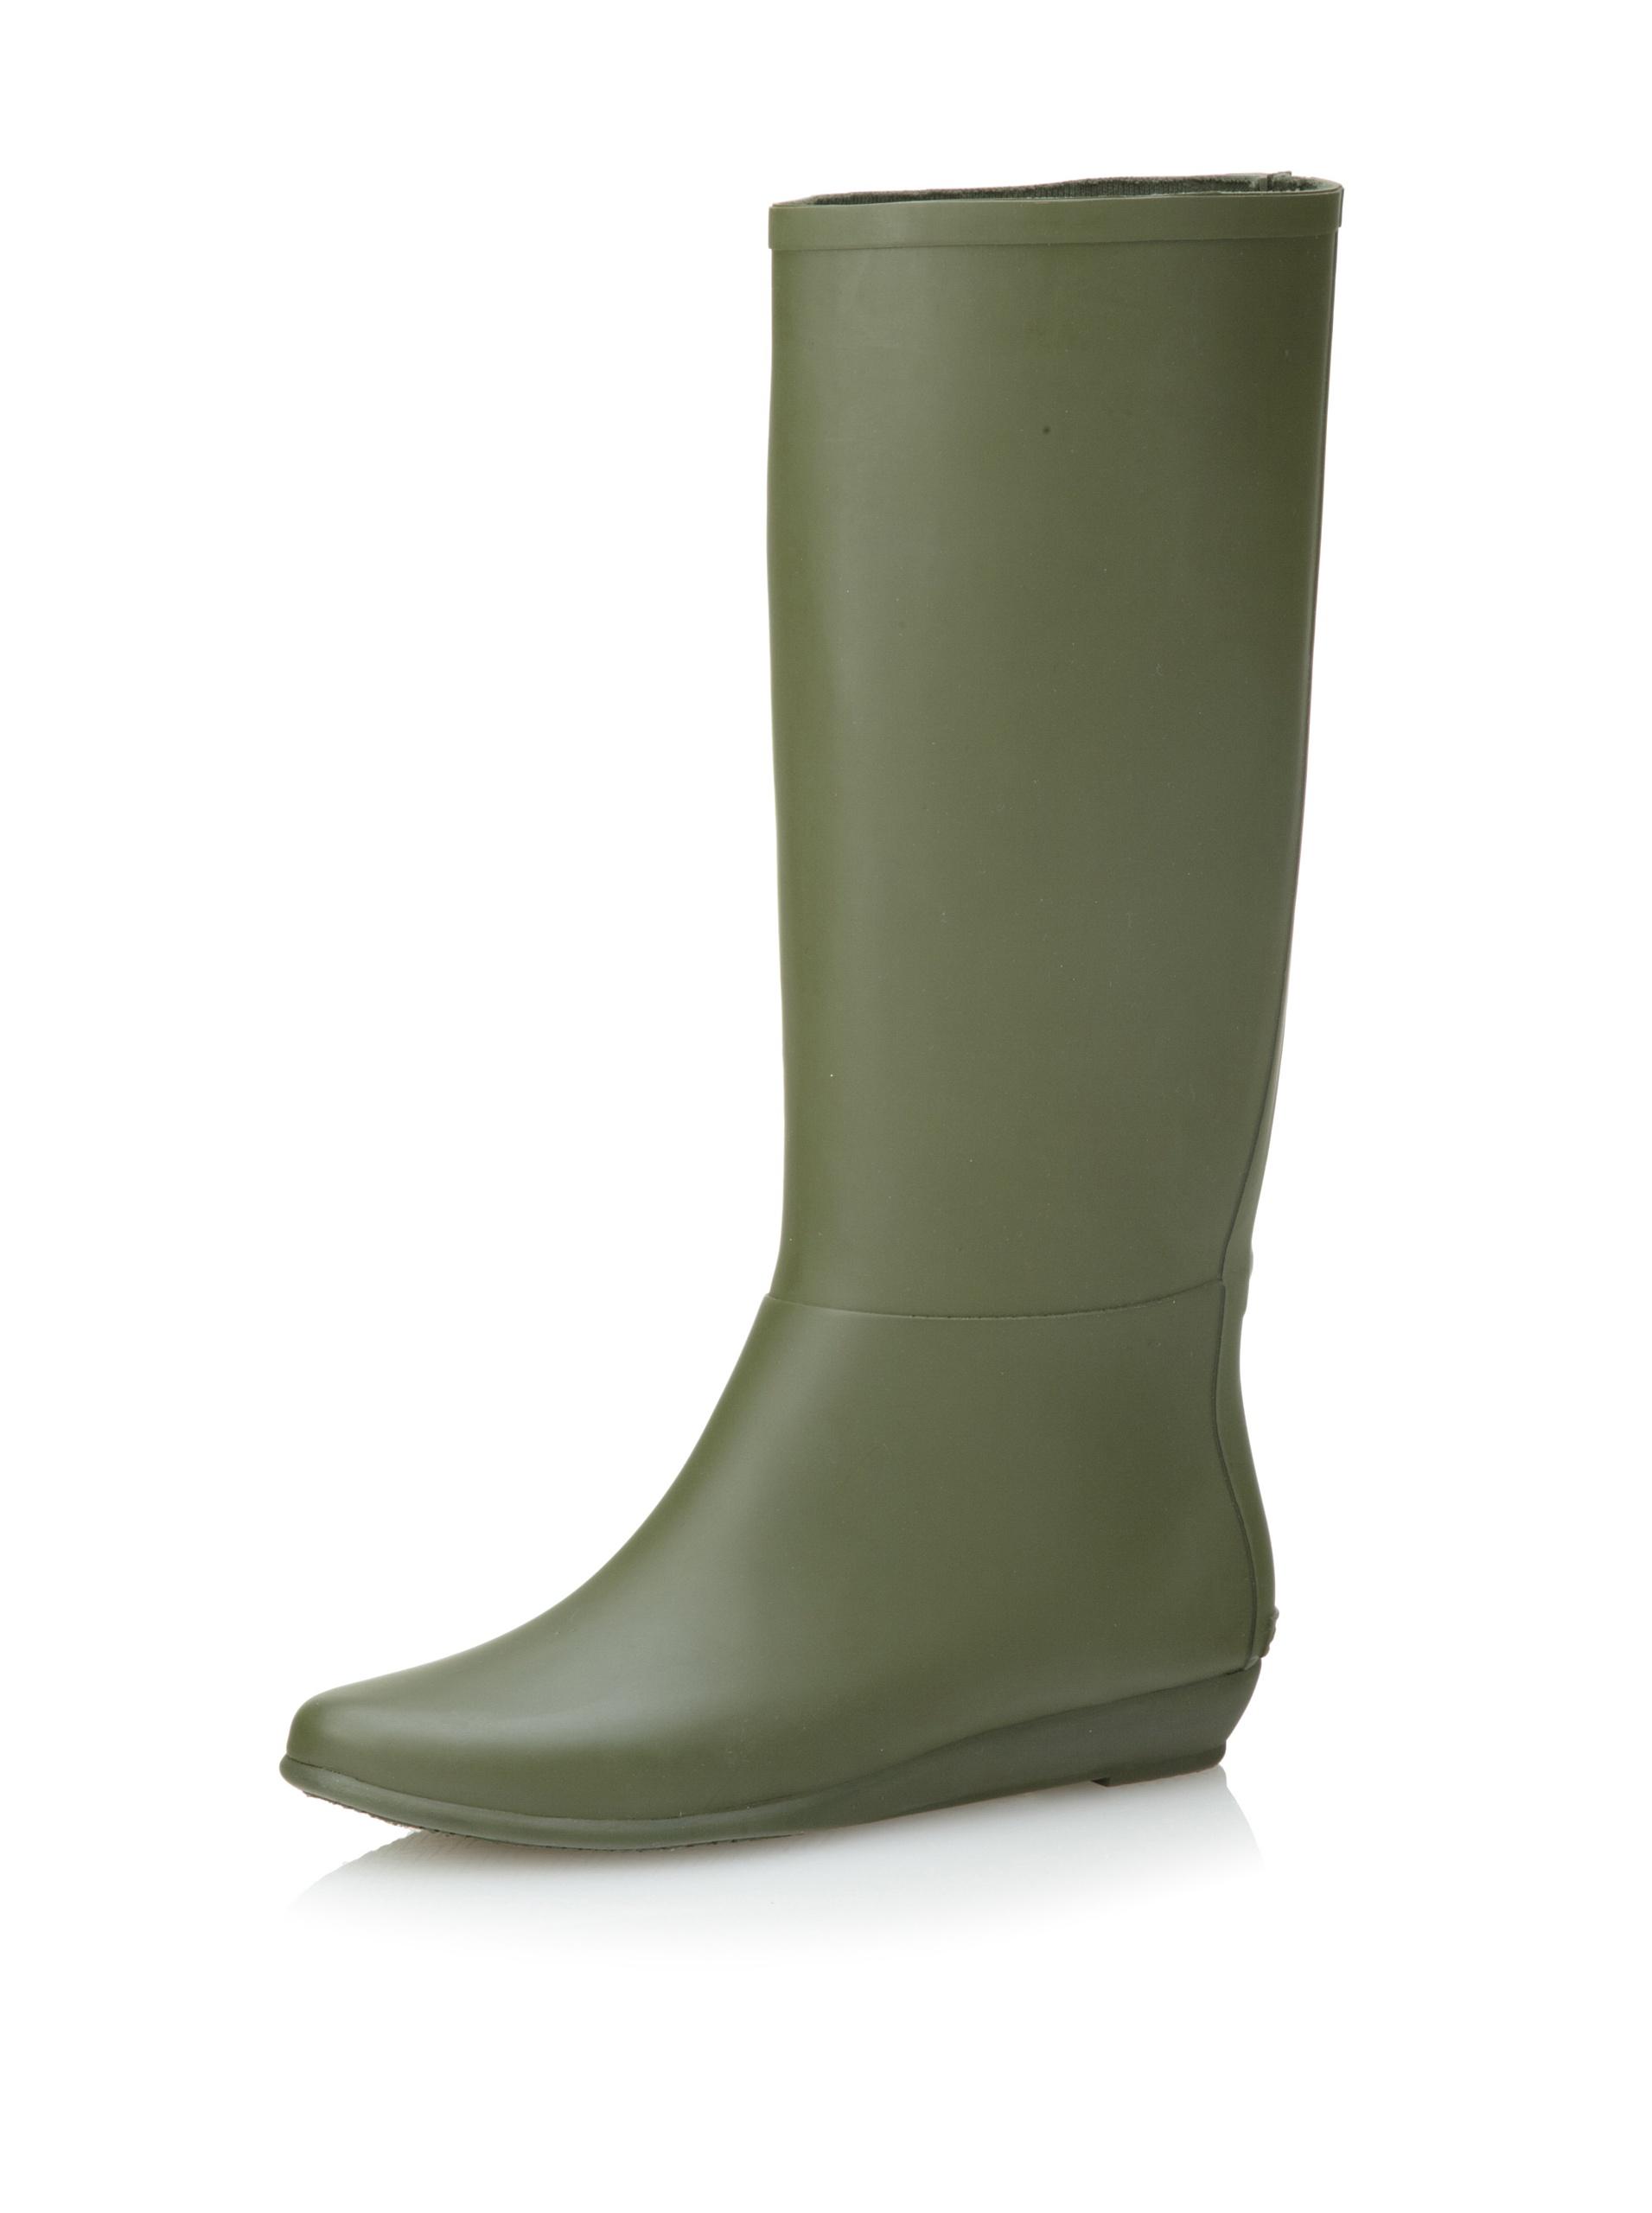 Loeffler Randall Women's LR Rain Boot (Army)